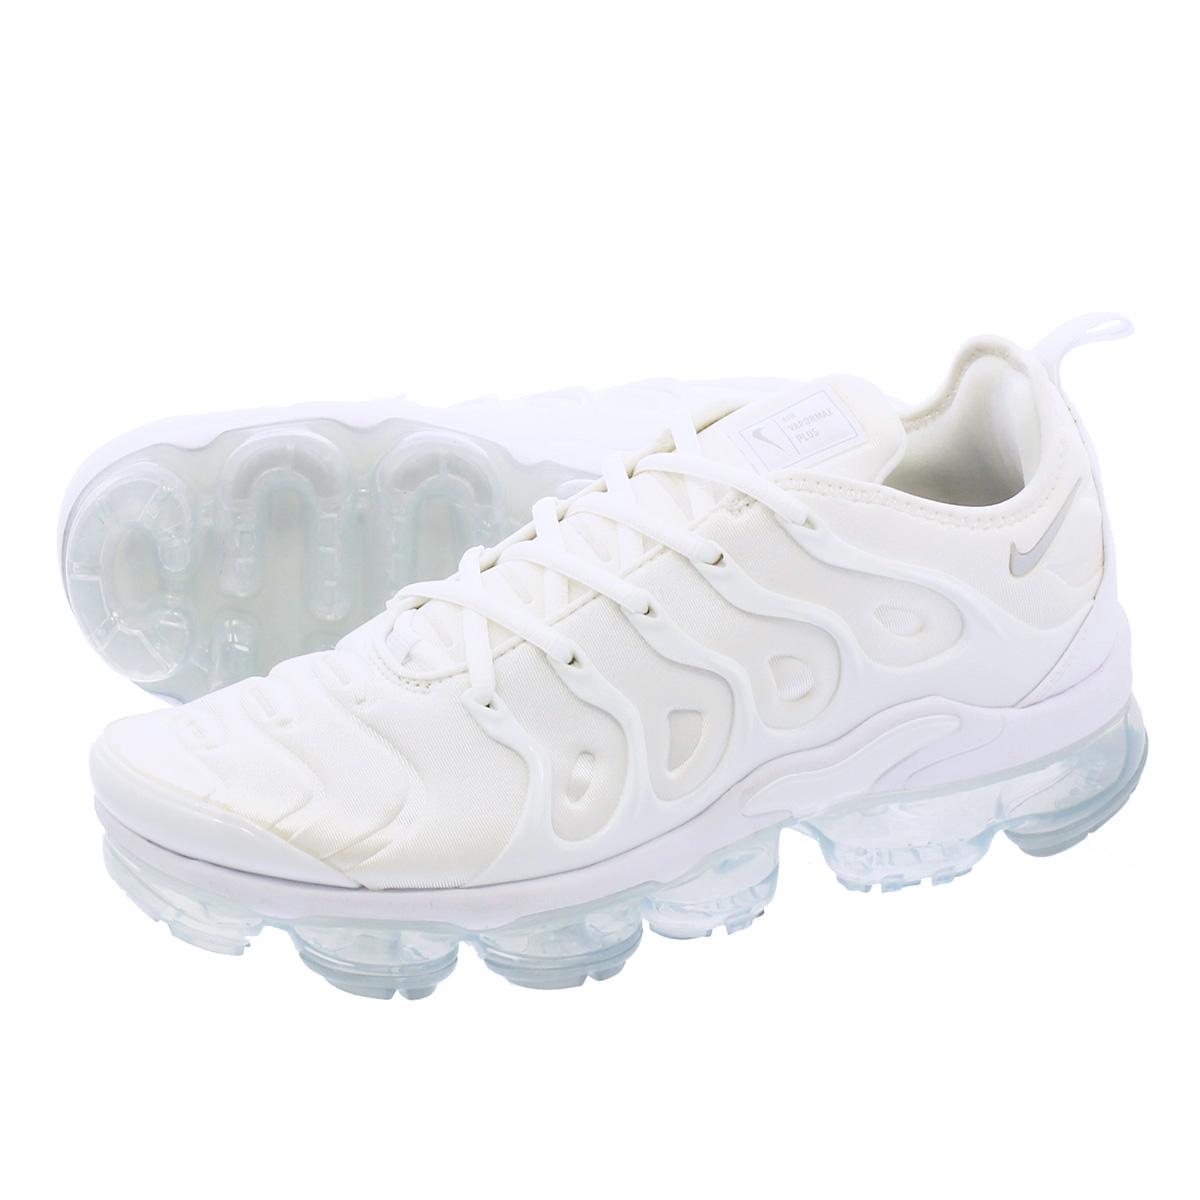 7b453197b8 NIKE AIR VAPORMAX PLUS Nike vapor max plus WHITE/WHITE/PURE PLATINUM  924,453- ...